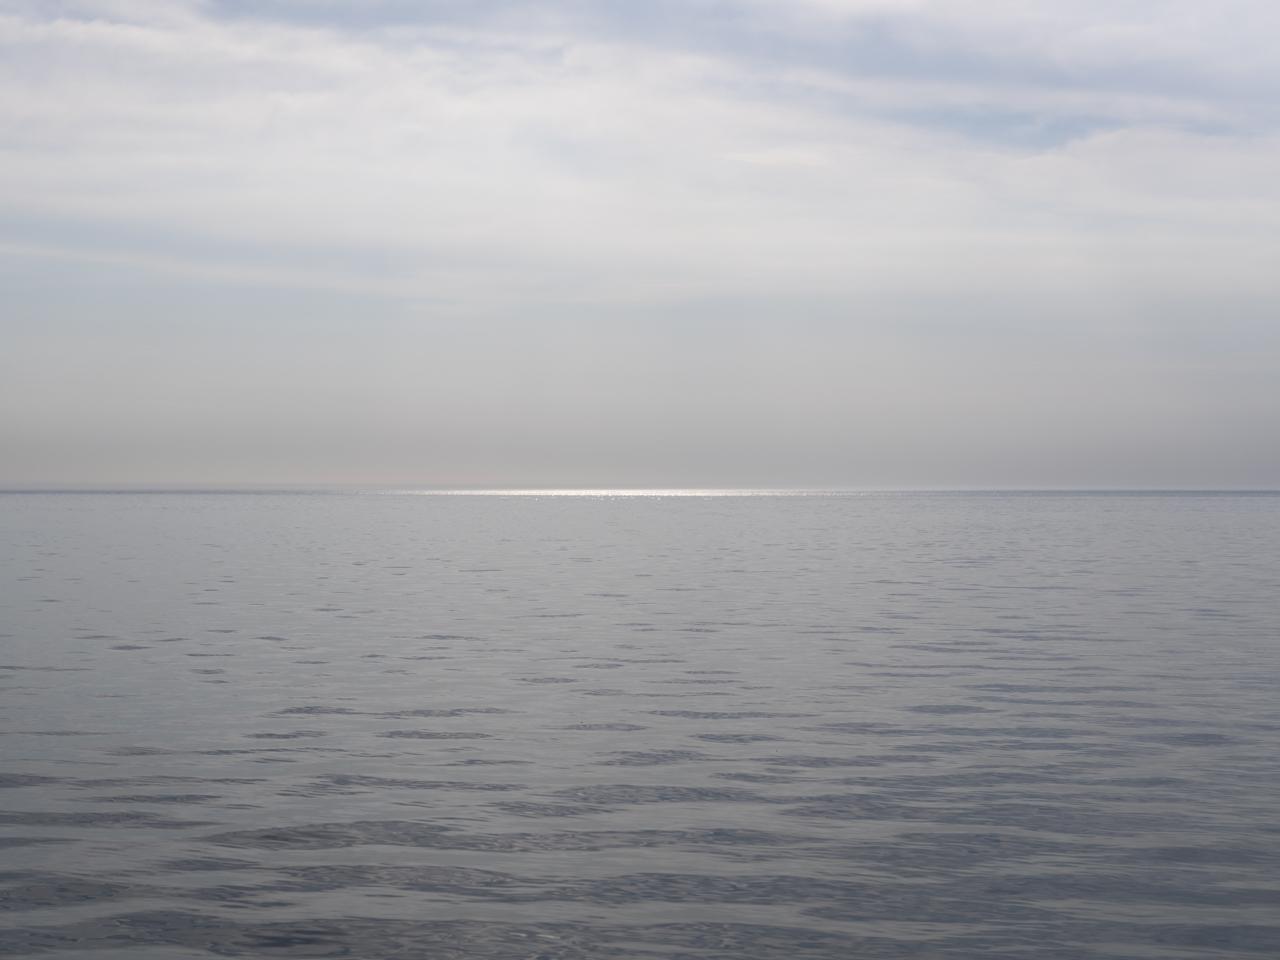 a sliver of light hits the water at the horizon of Lake Michigan